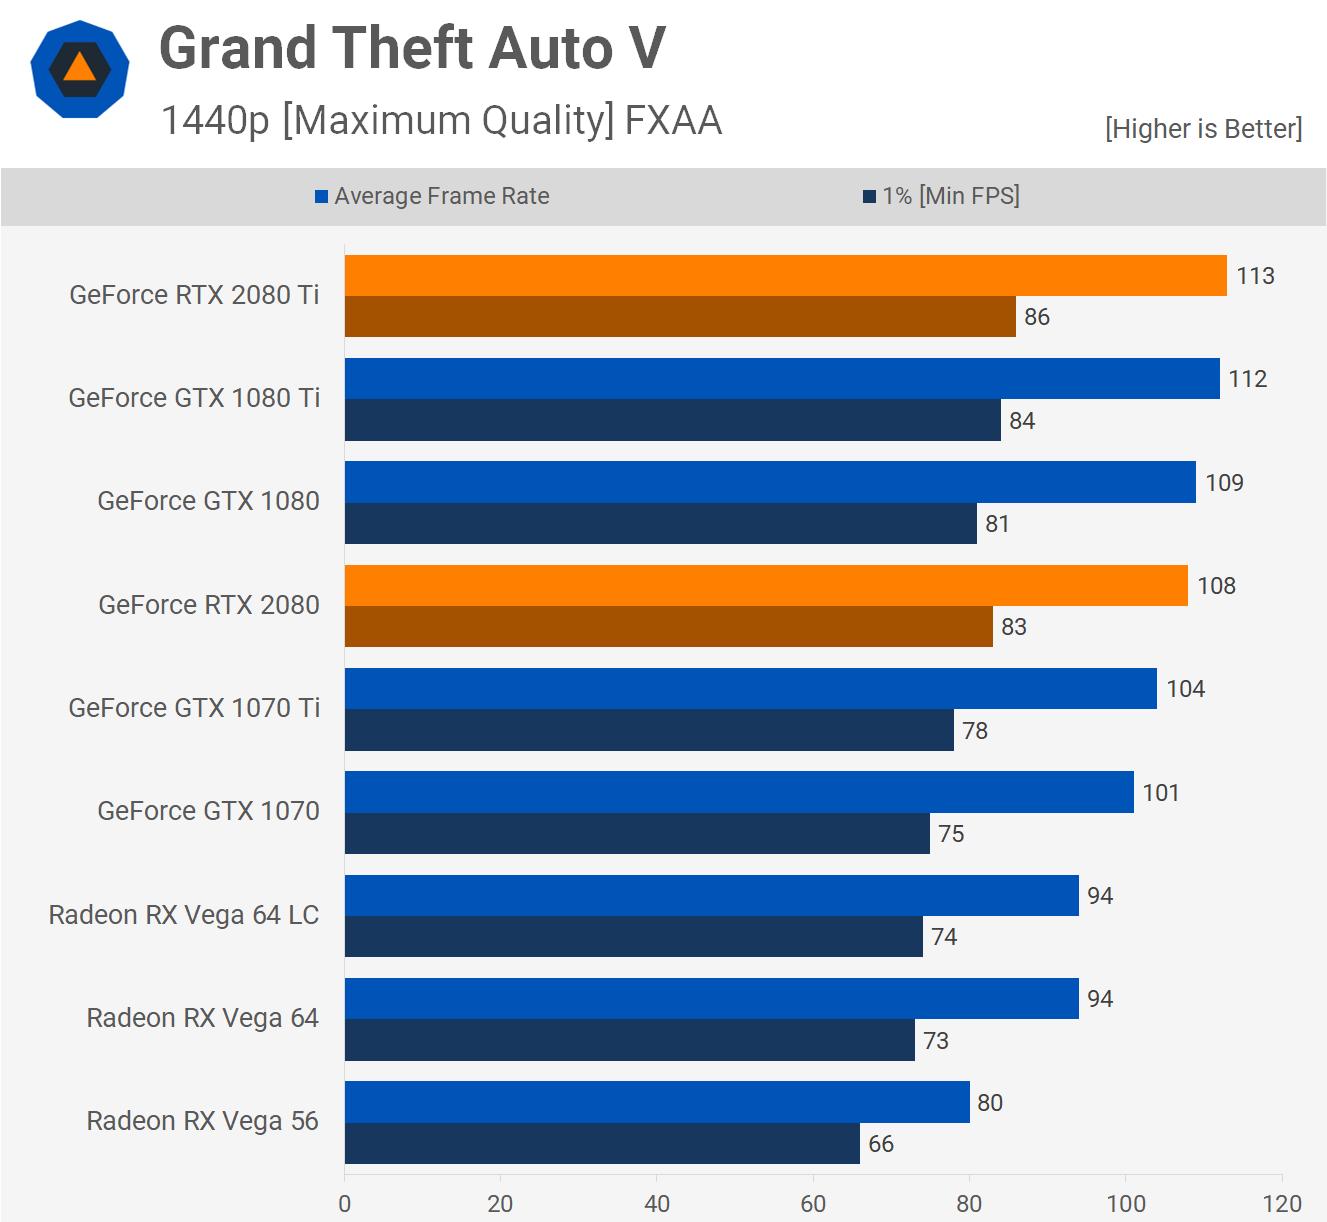 Grand Theft Auto V (GTA5)